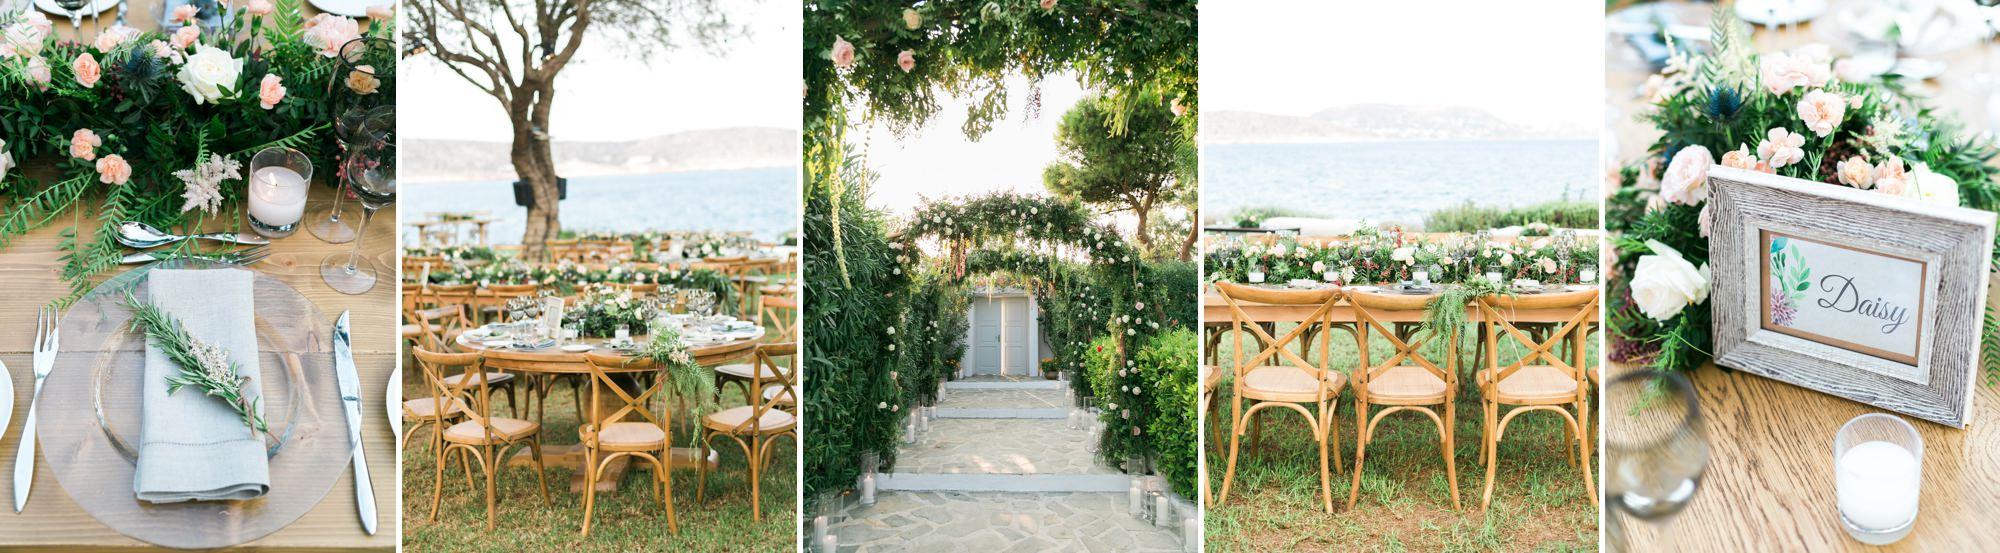 top wedding photography ideas now